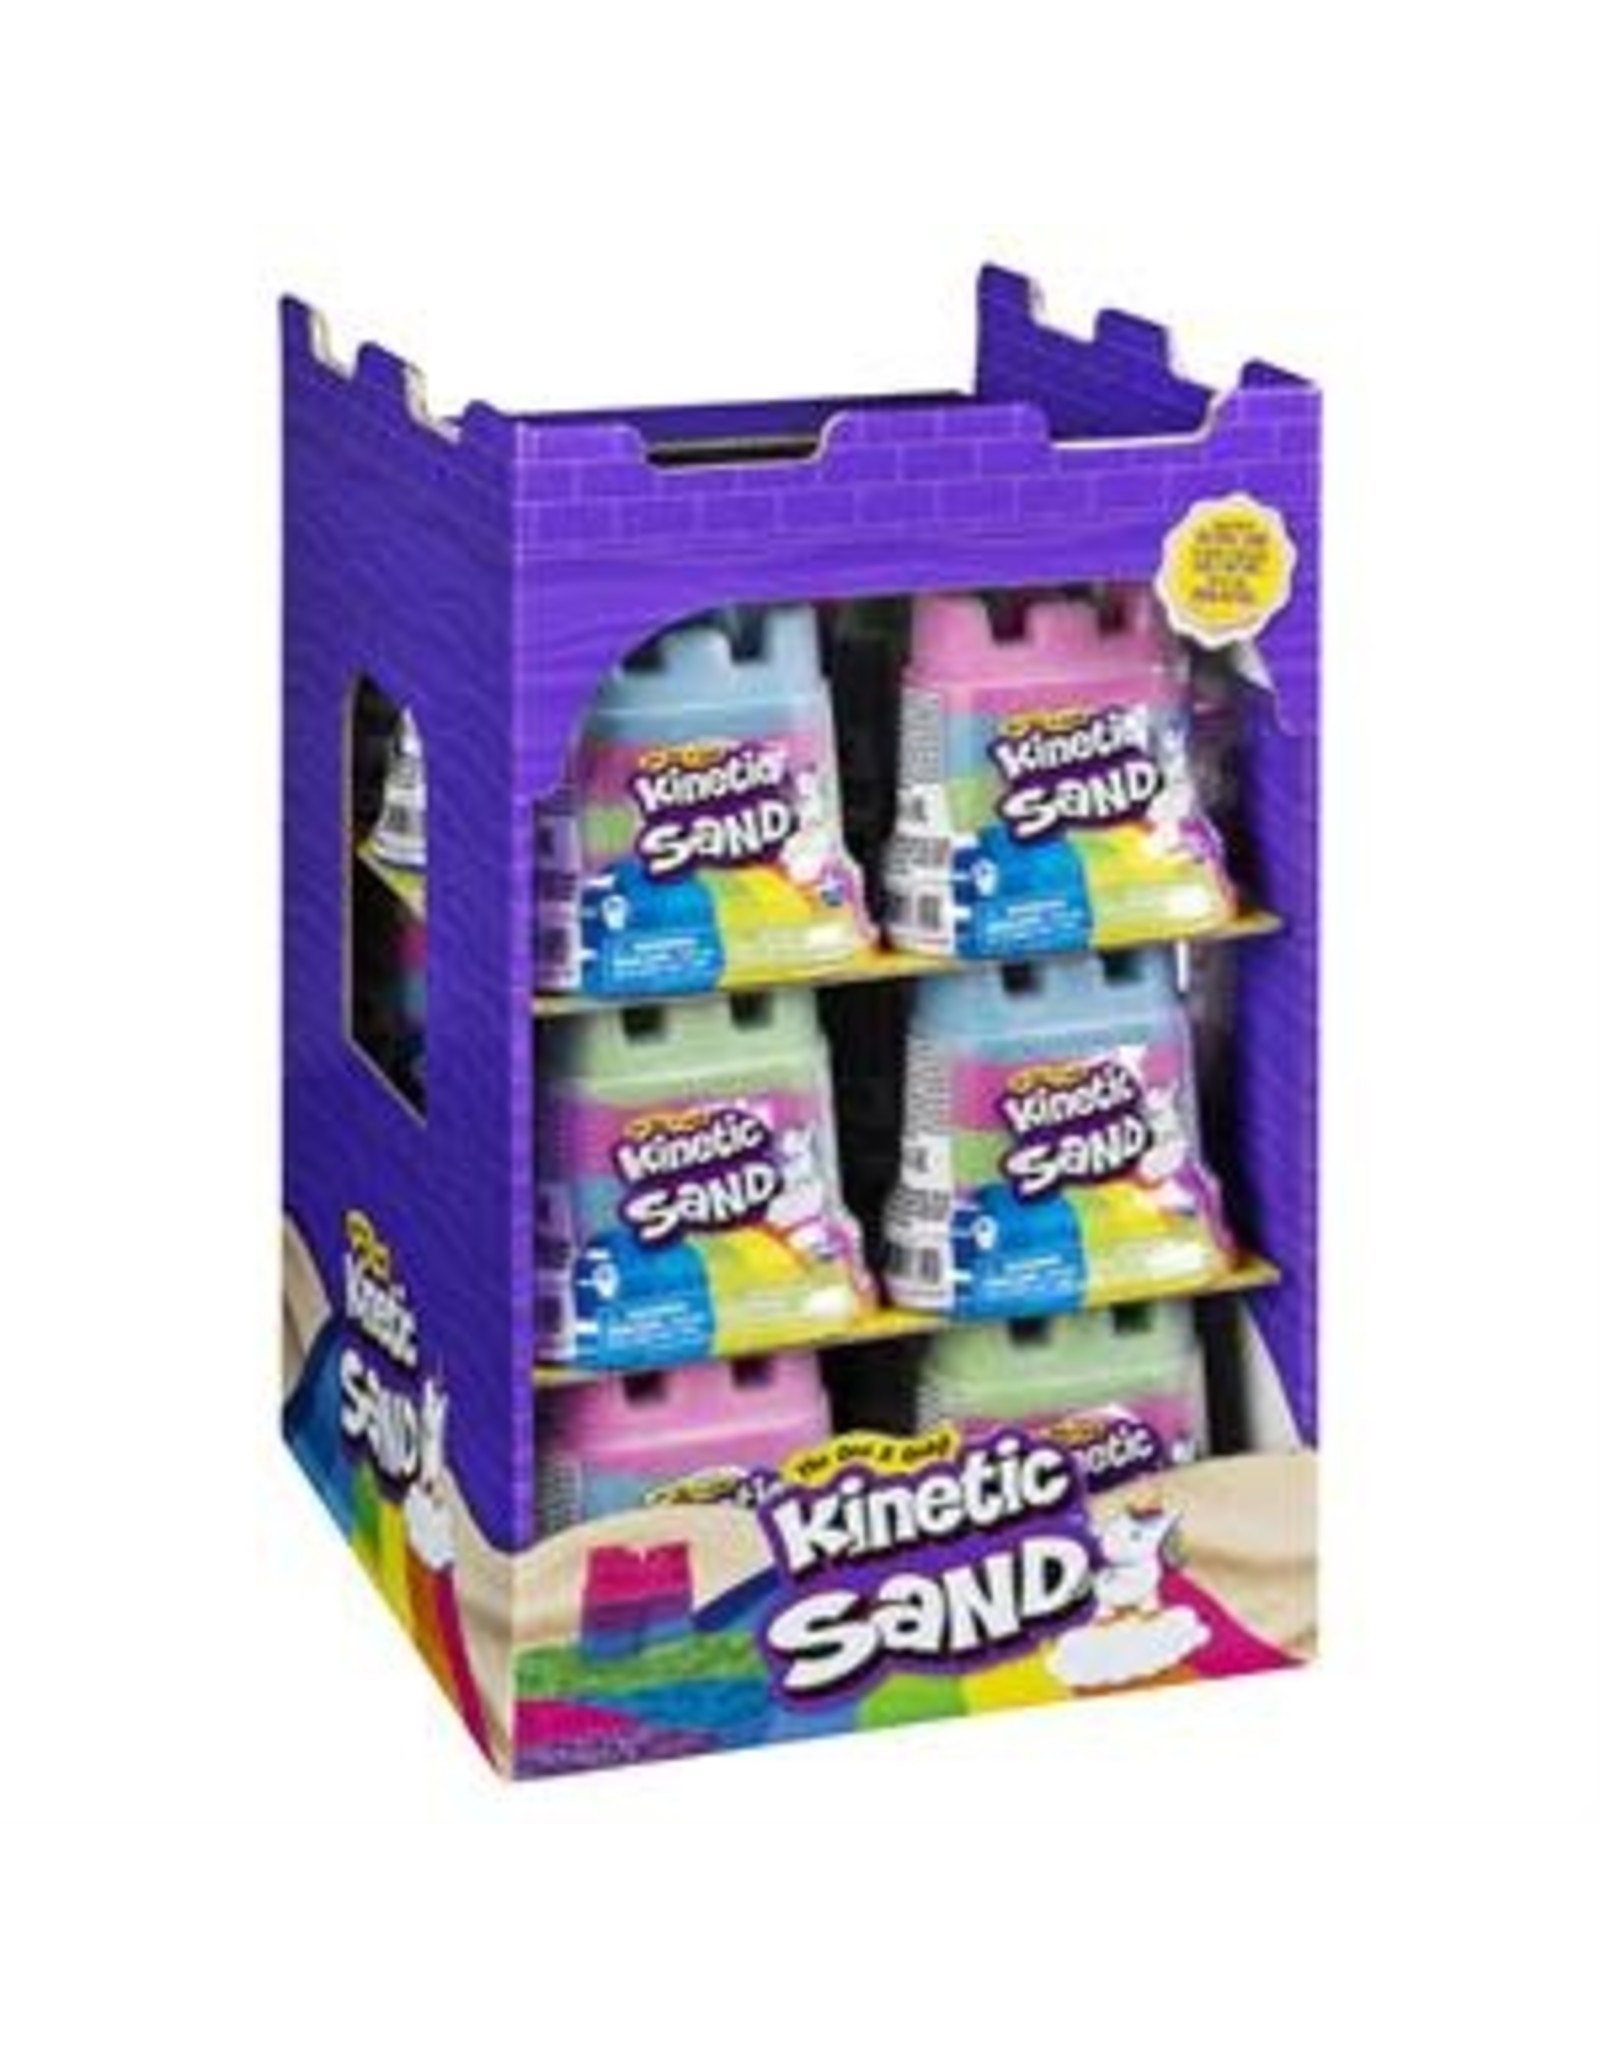 Gund/Spinmaster Kinetic Sand, Rainbow Unicorn  Multicolor 5oz